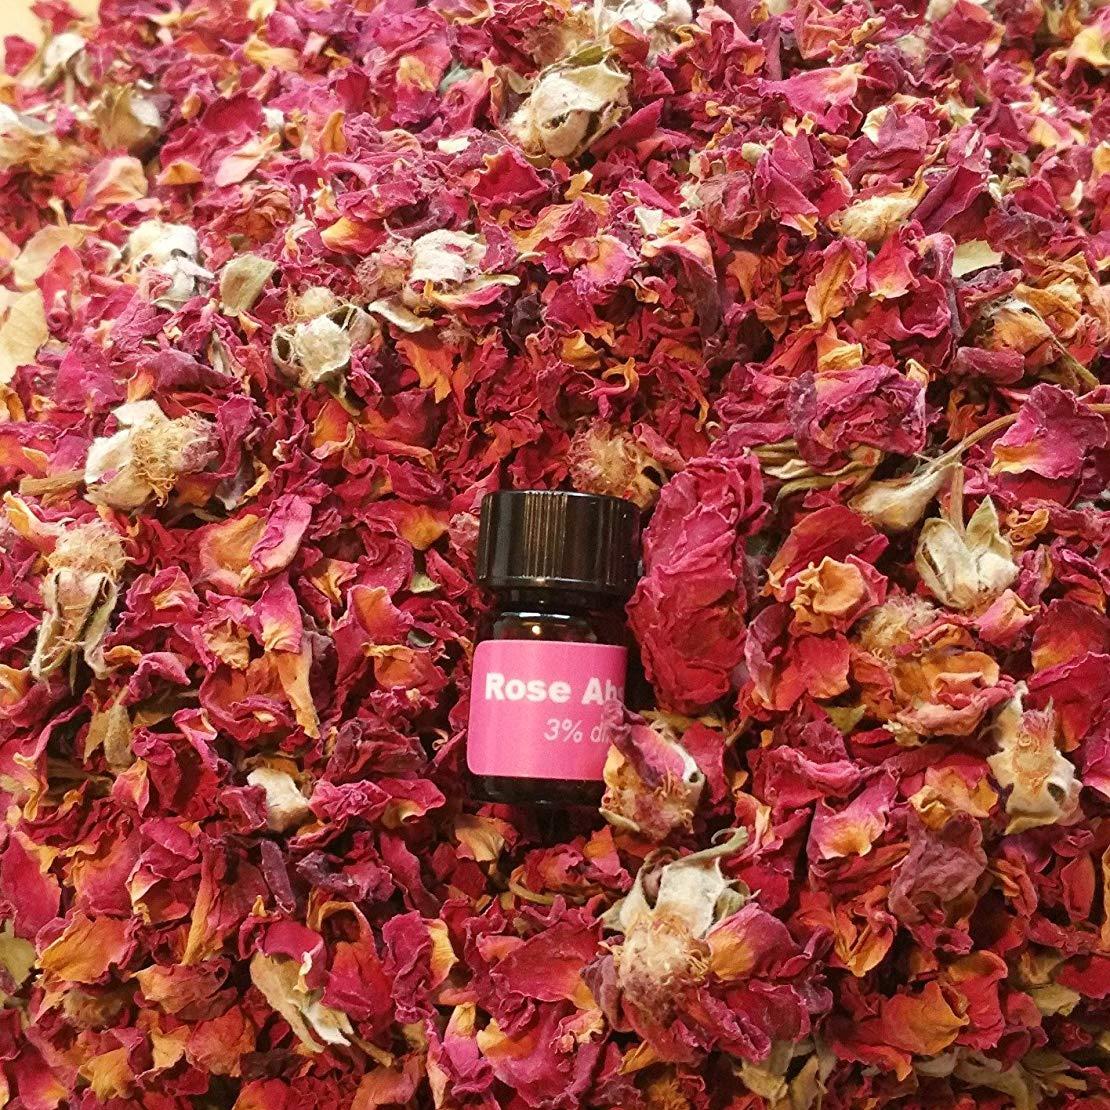 DBBE+Dried+Rose+Buds+%26+Petals+-+1lb+Bag.jpg